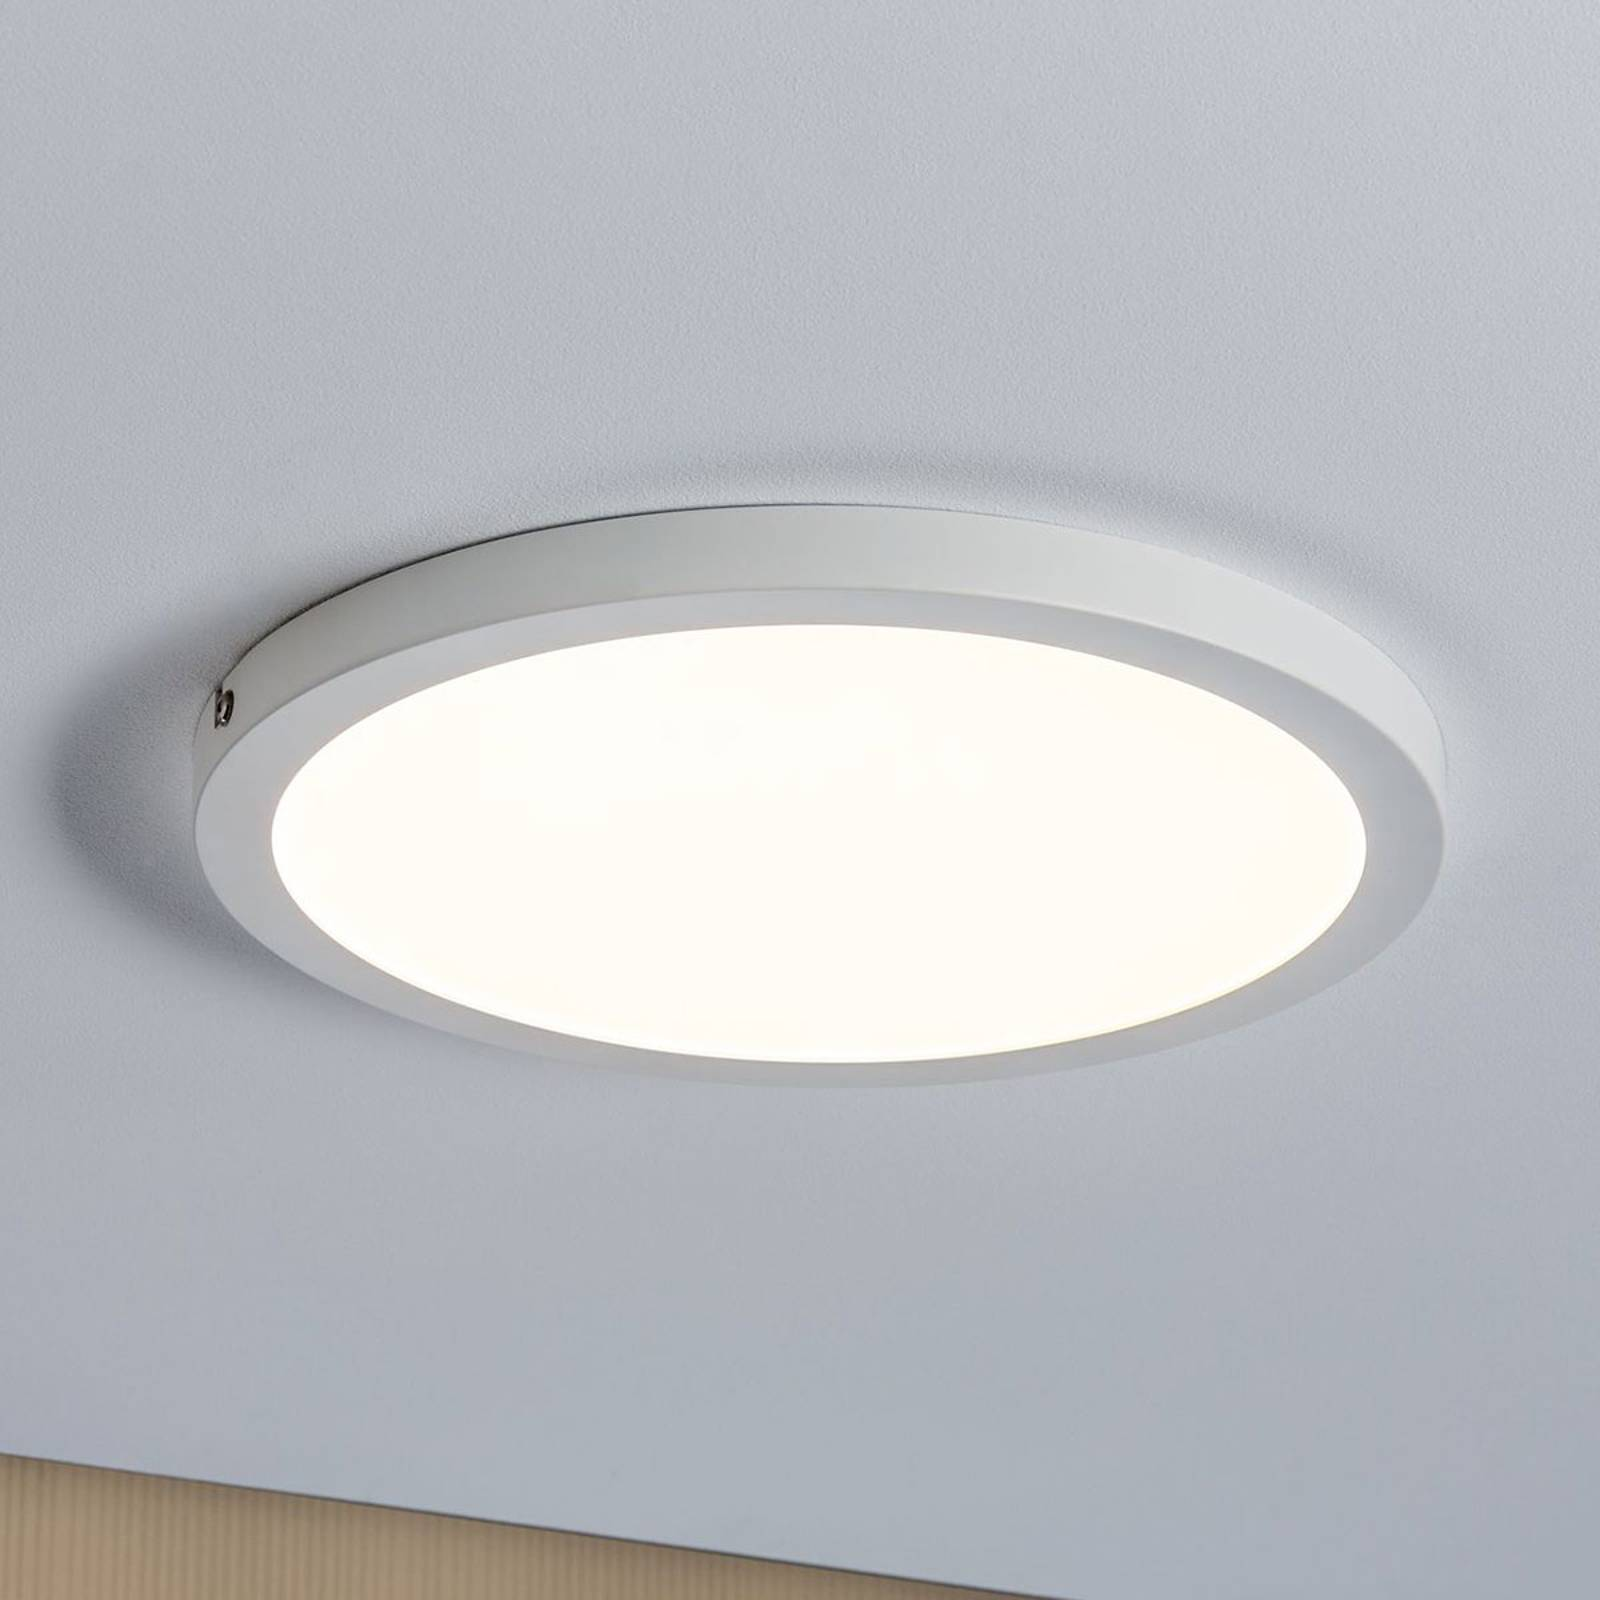 Paulmann Atria LED-Deckenleuchte Ø30cm weiß matt